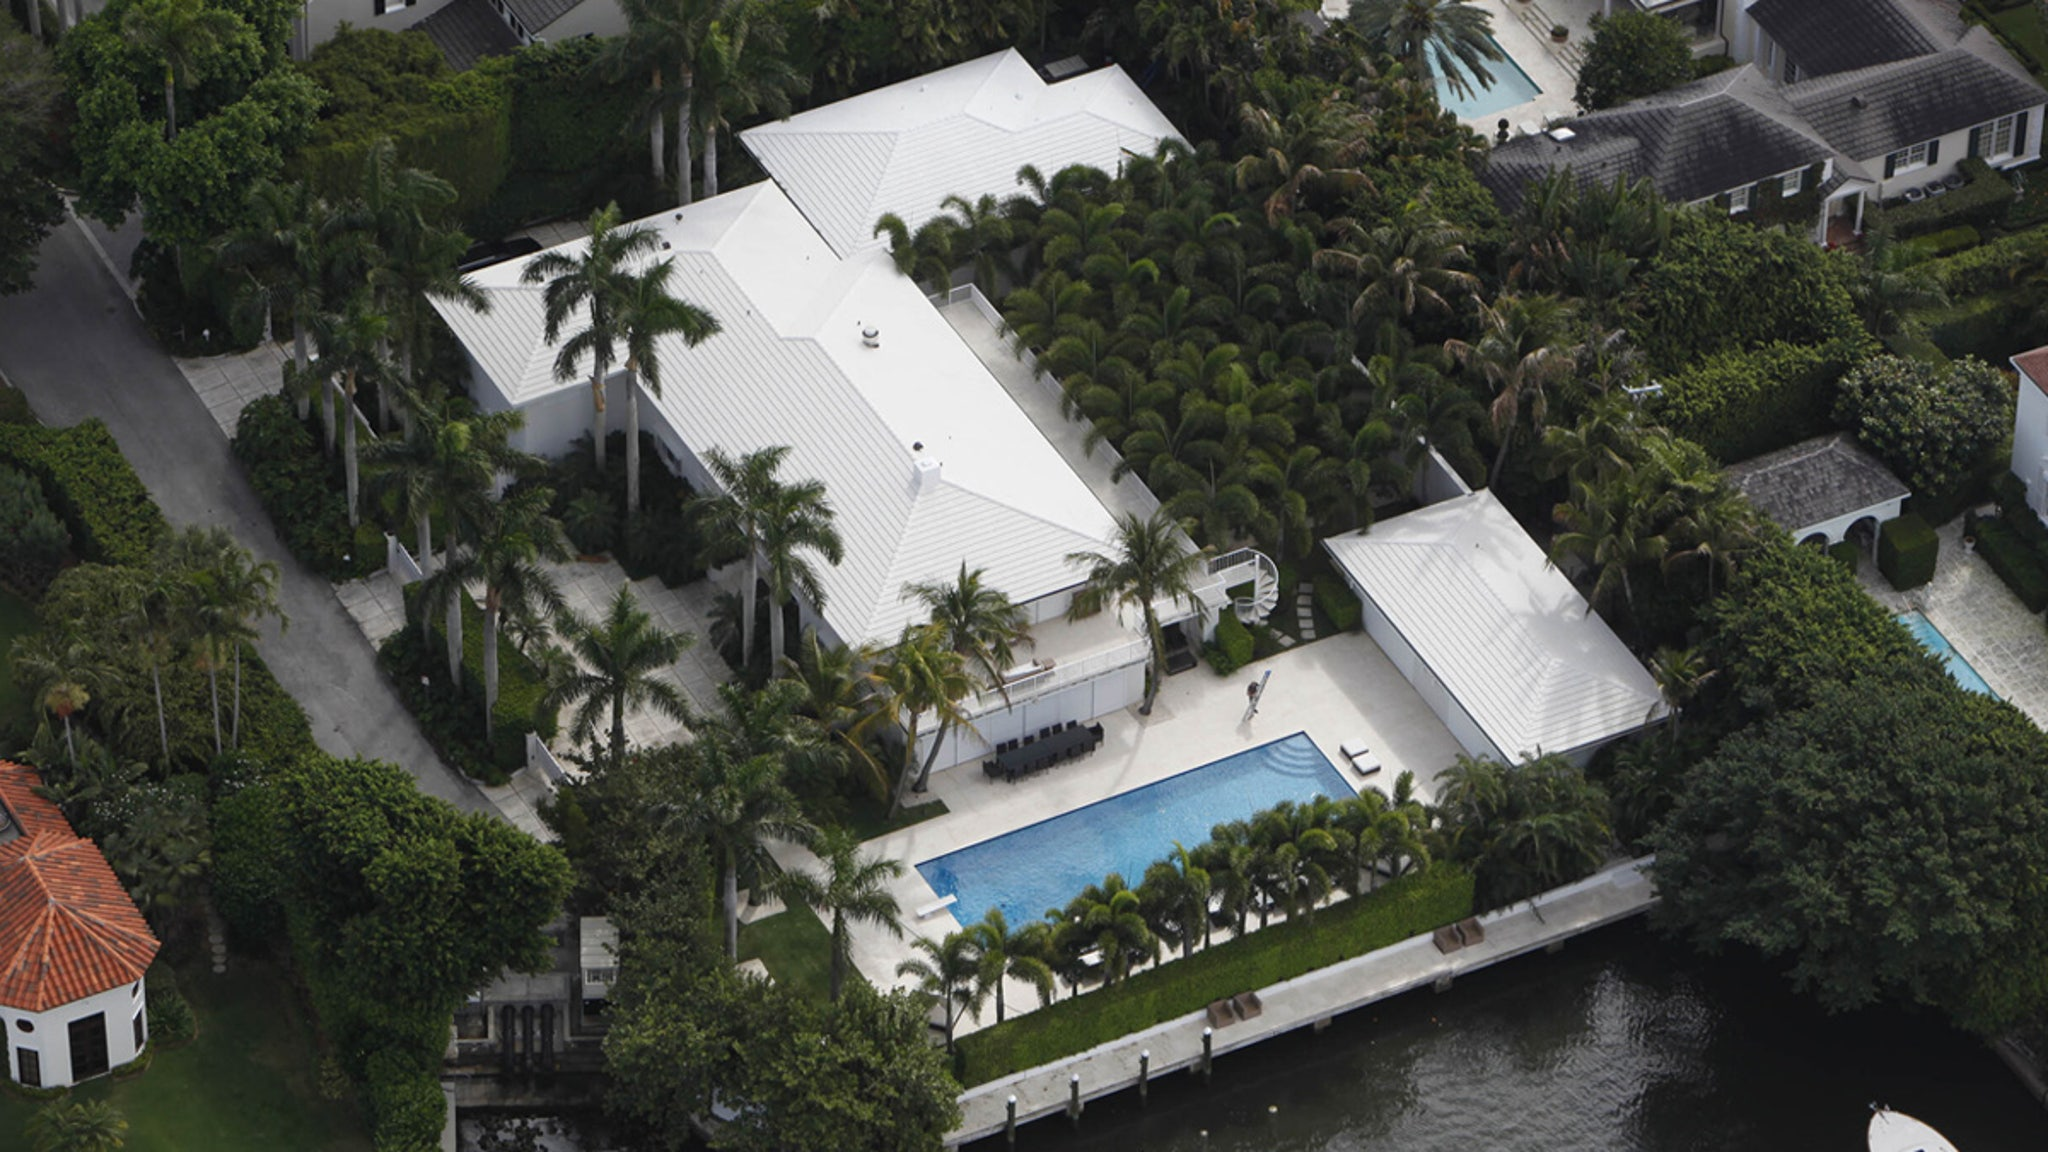 Jeffrey Epstein Palm Beach Pad Will Be Demolished